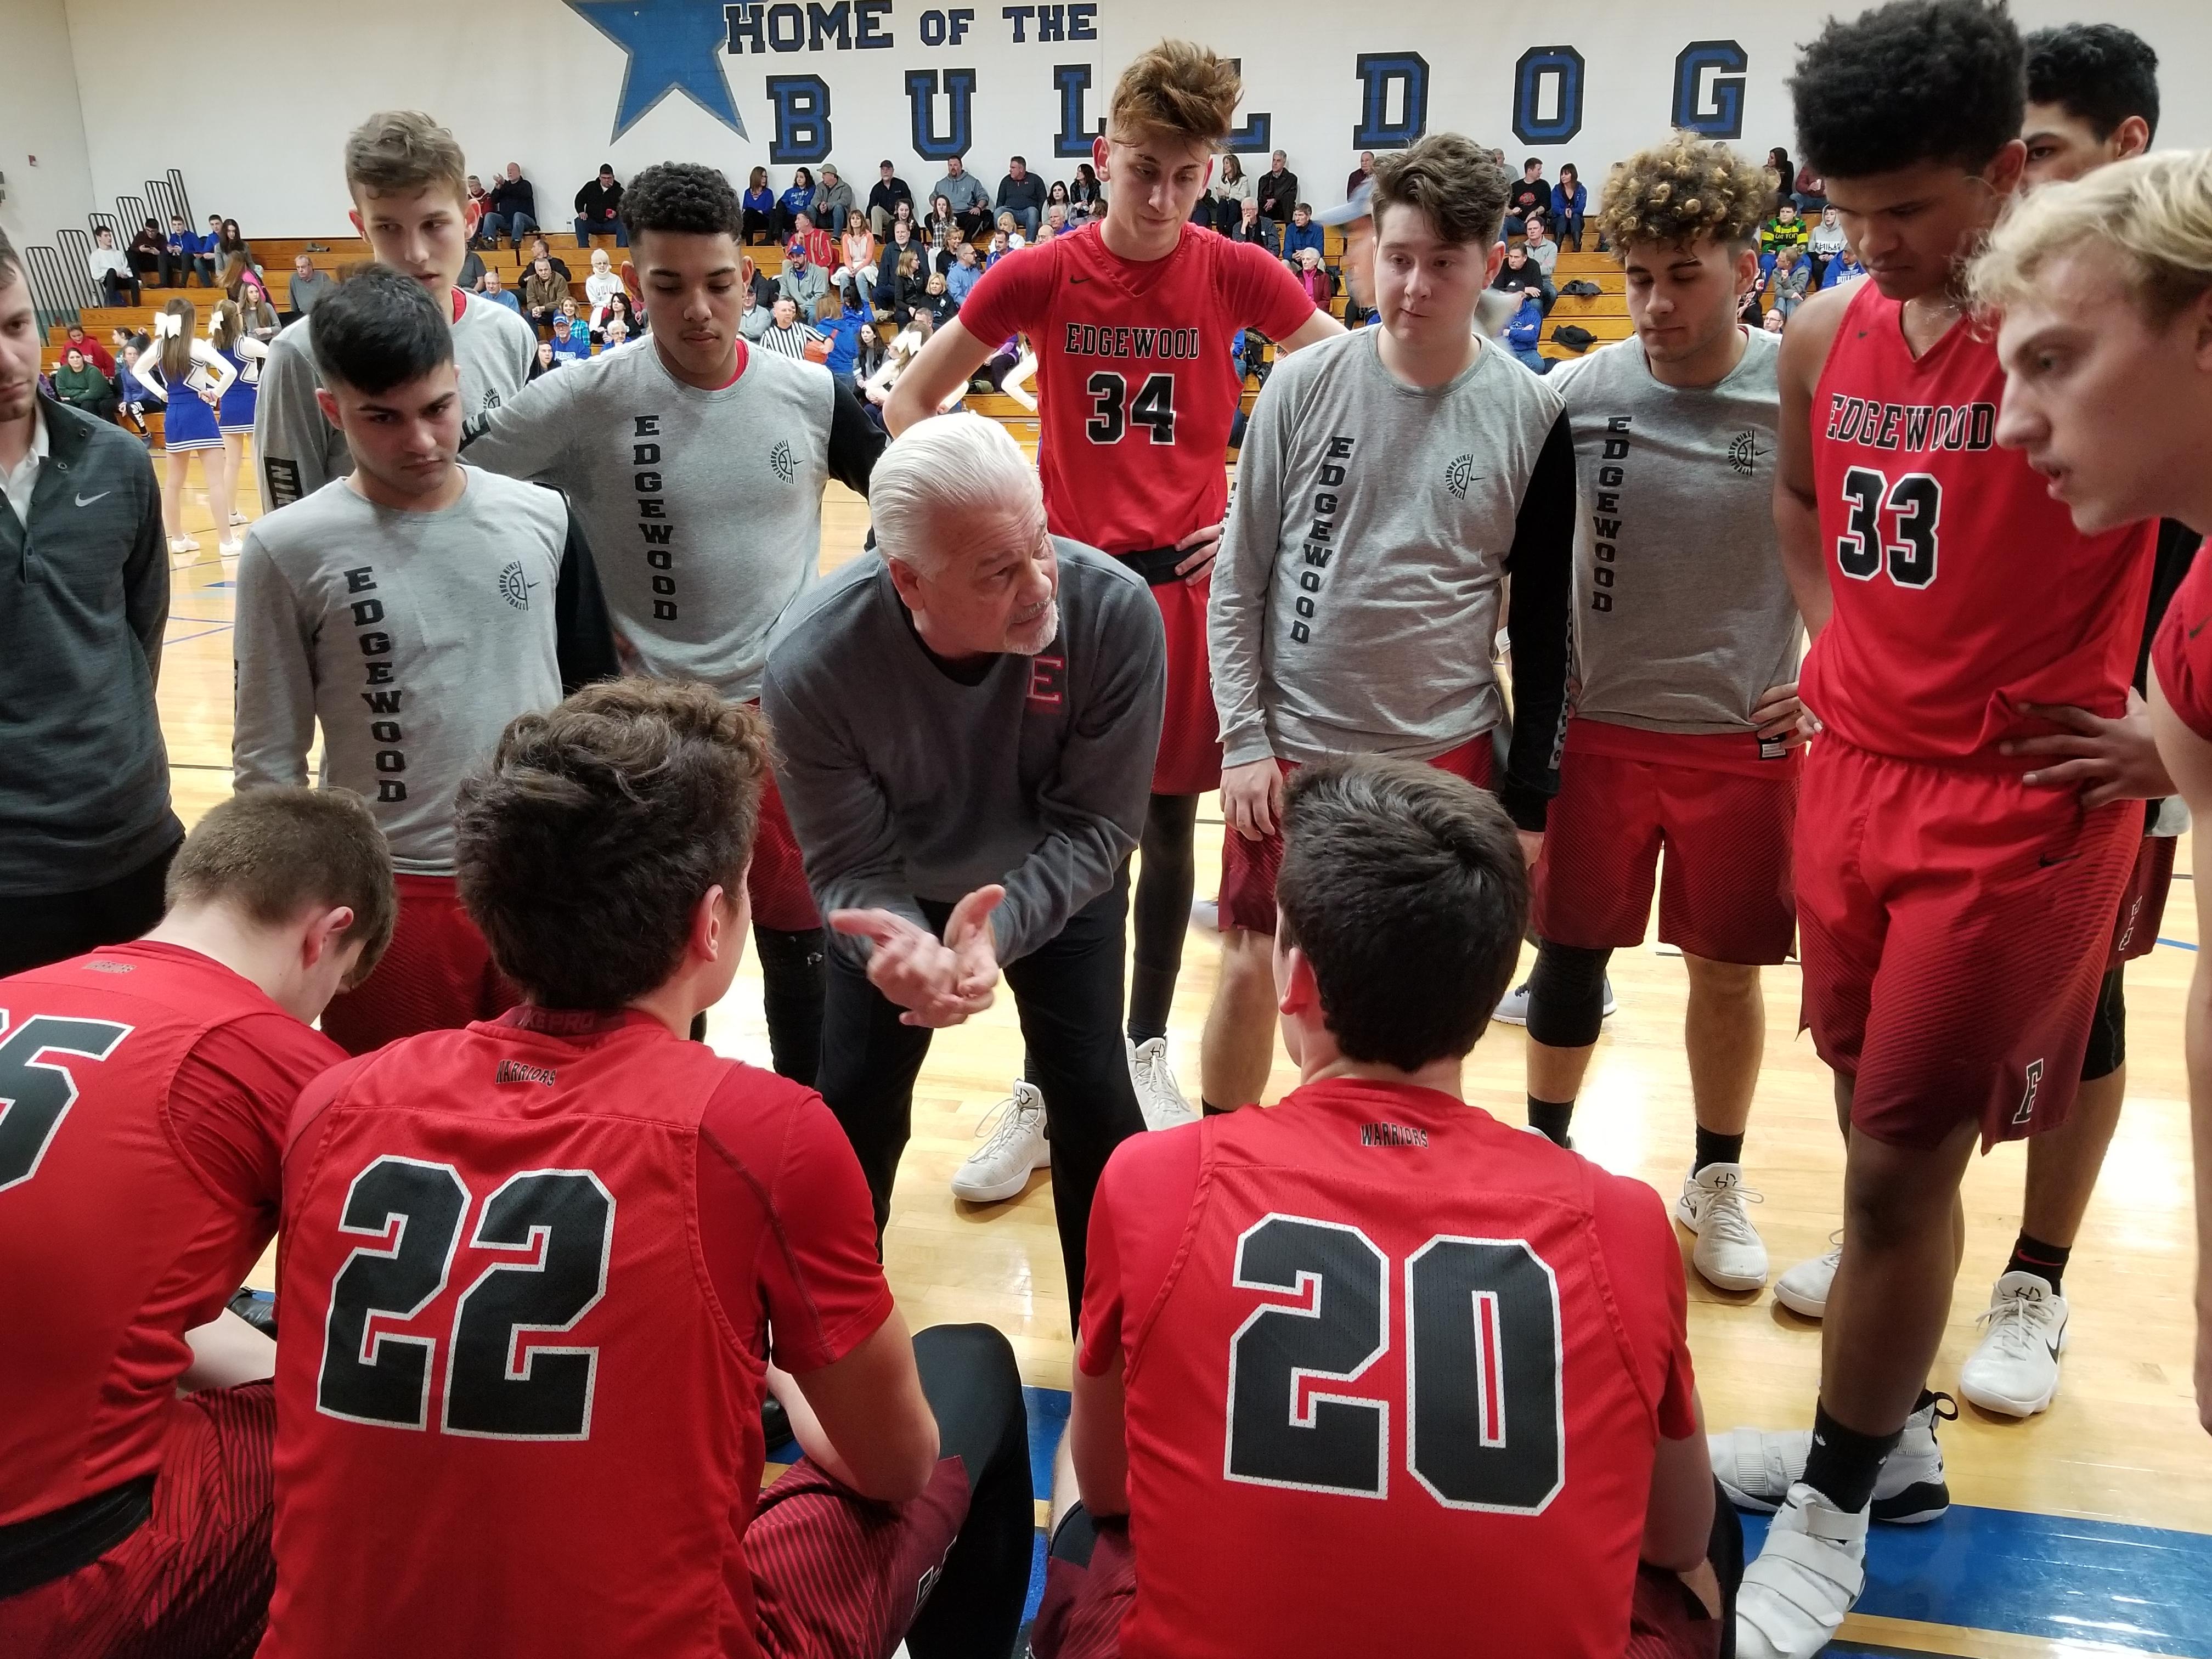 2018 7th and 8th Grade Warrior Boys Basketball Camp